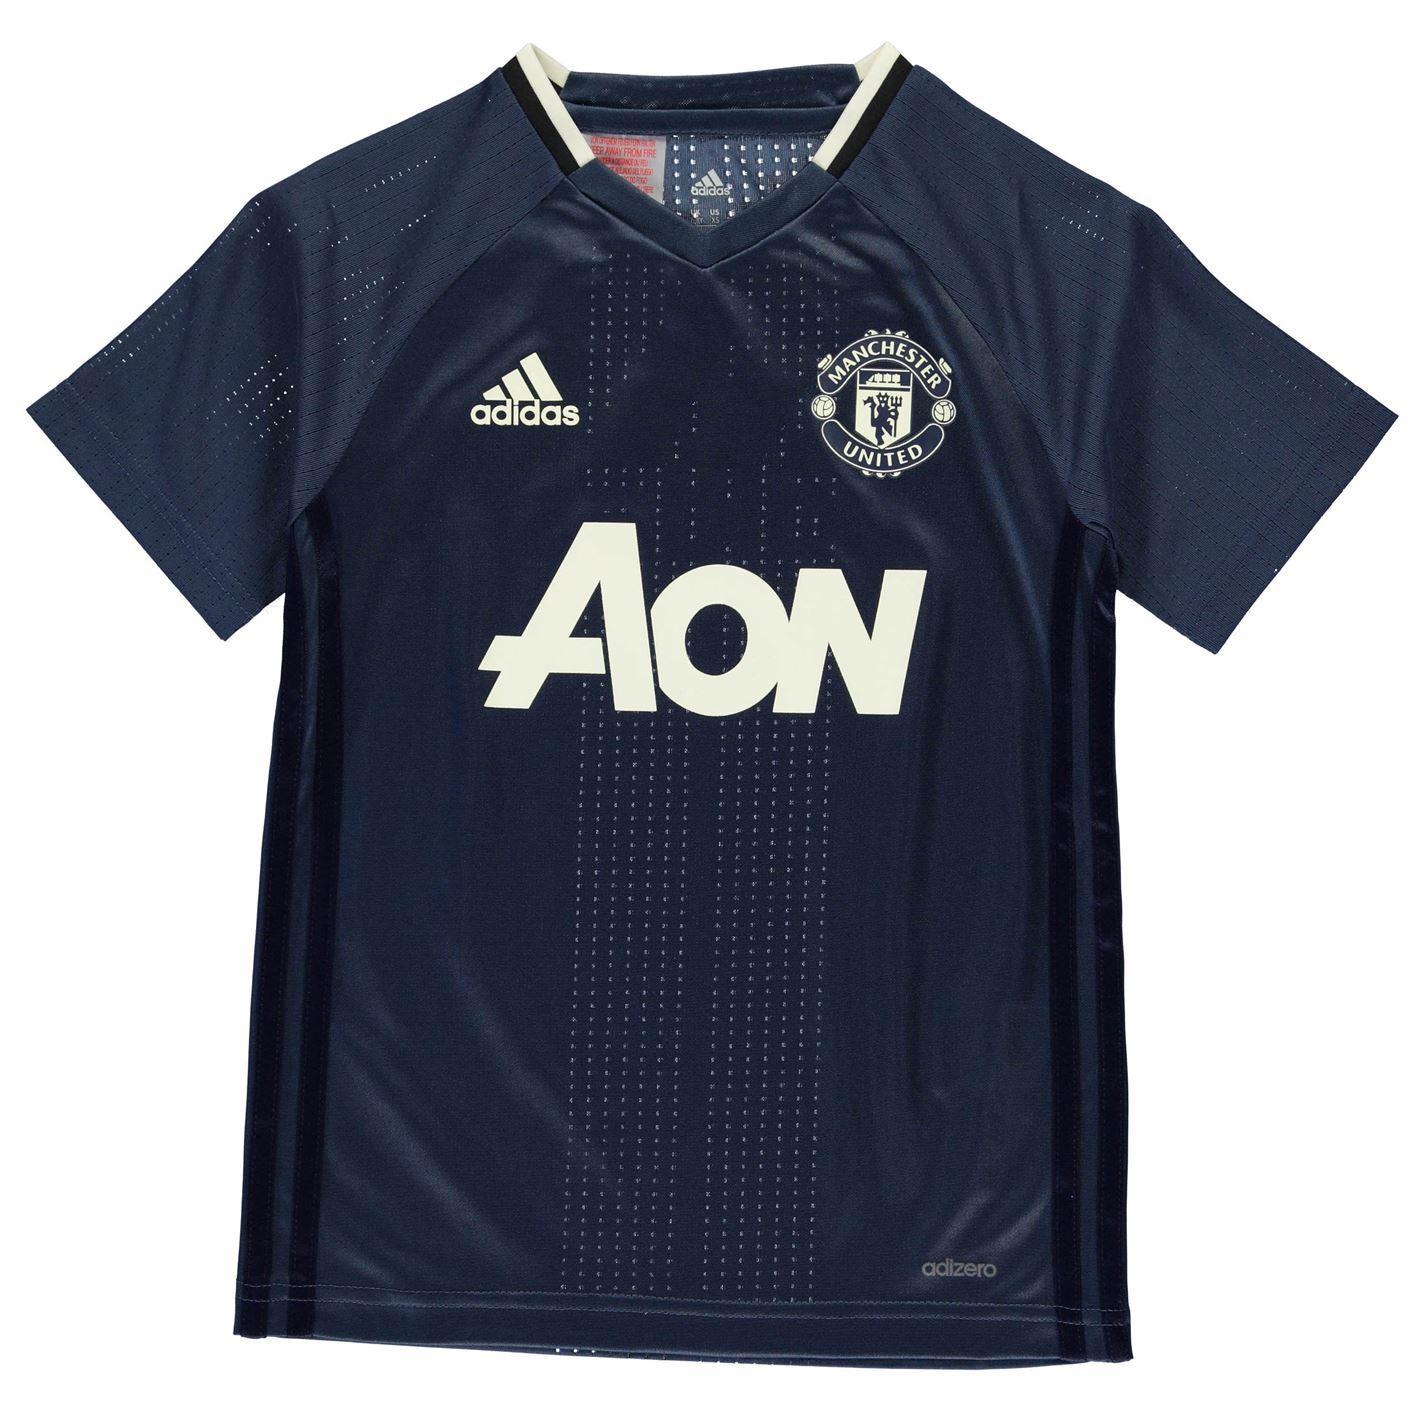 1e35f4996 ... Adidas Manchester United FC Training Jersey Juniors Blue Navy Football  Soccer